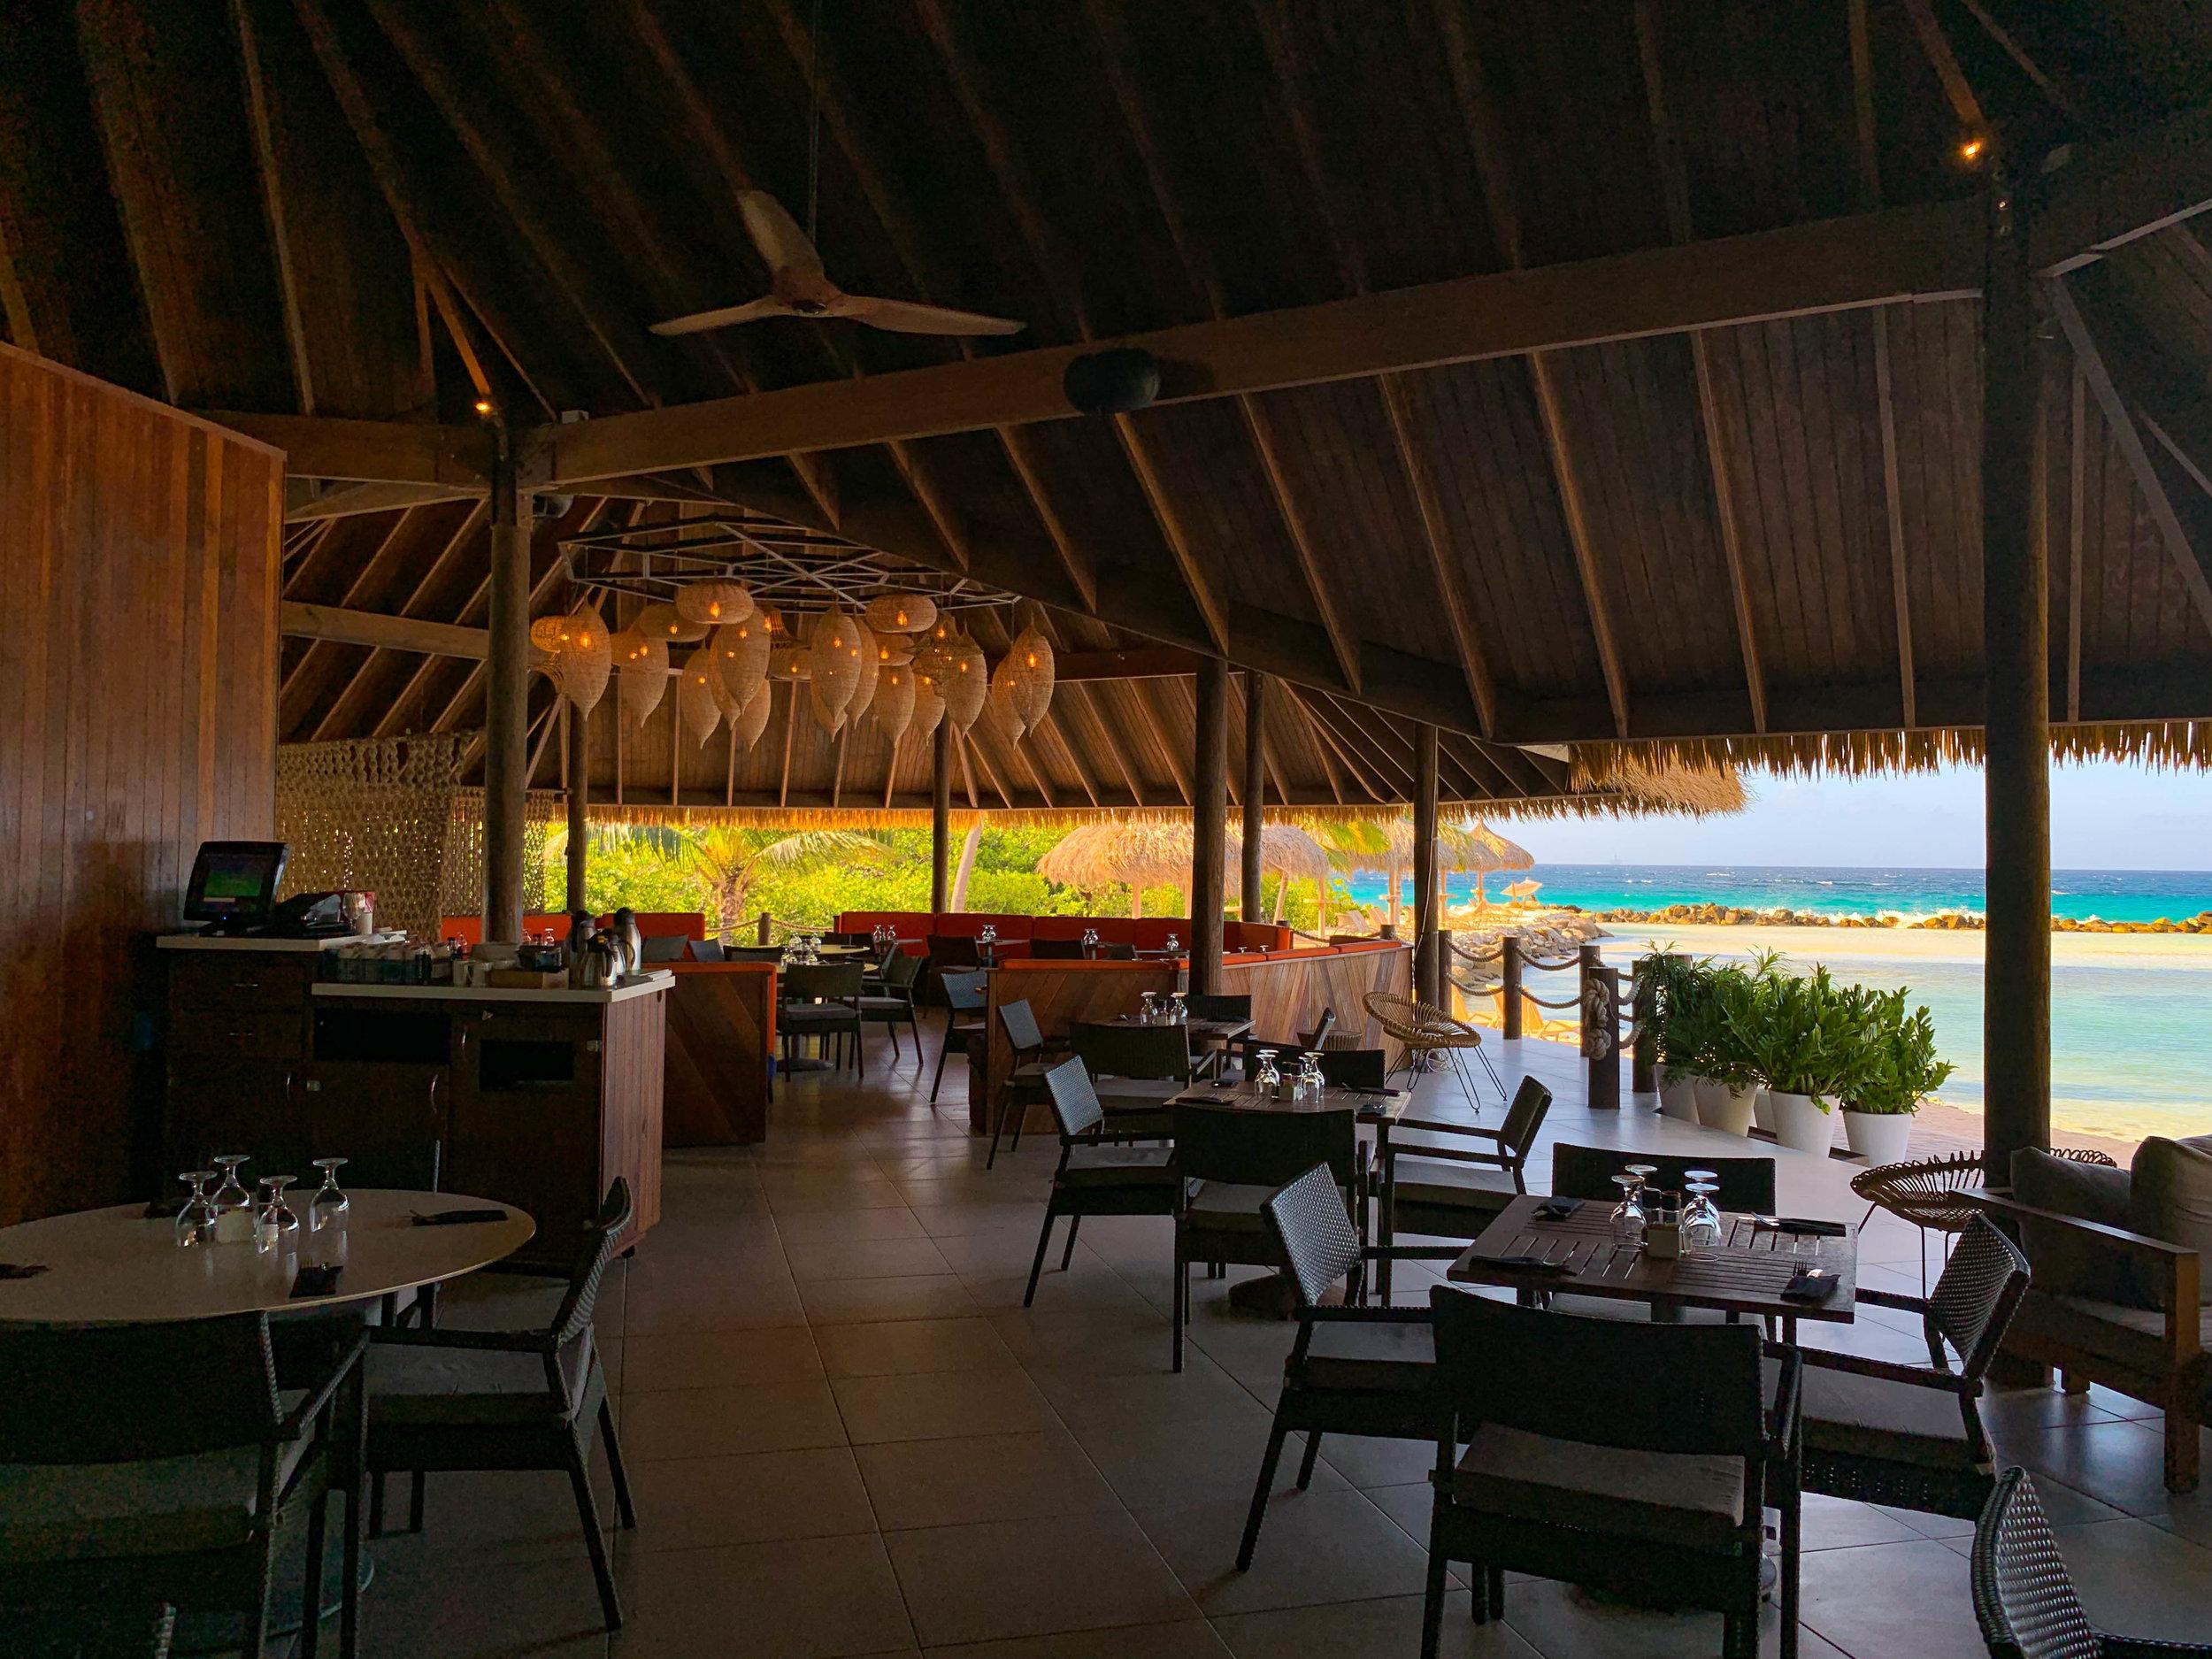 Iguana Beach Renaissance Island Restaurant